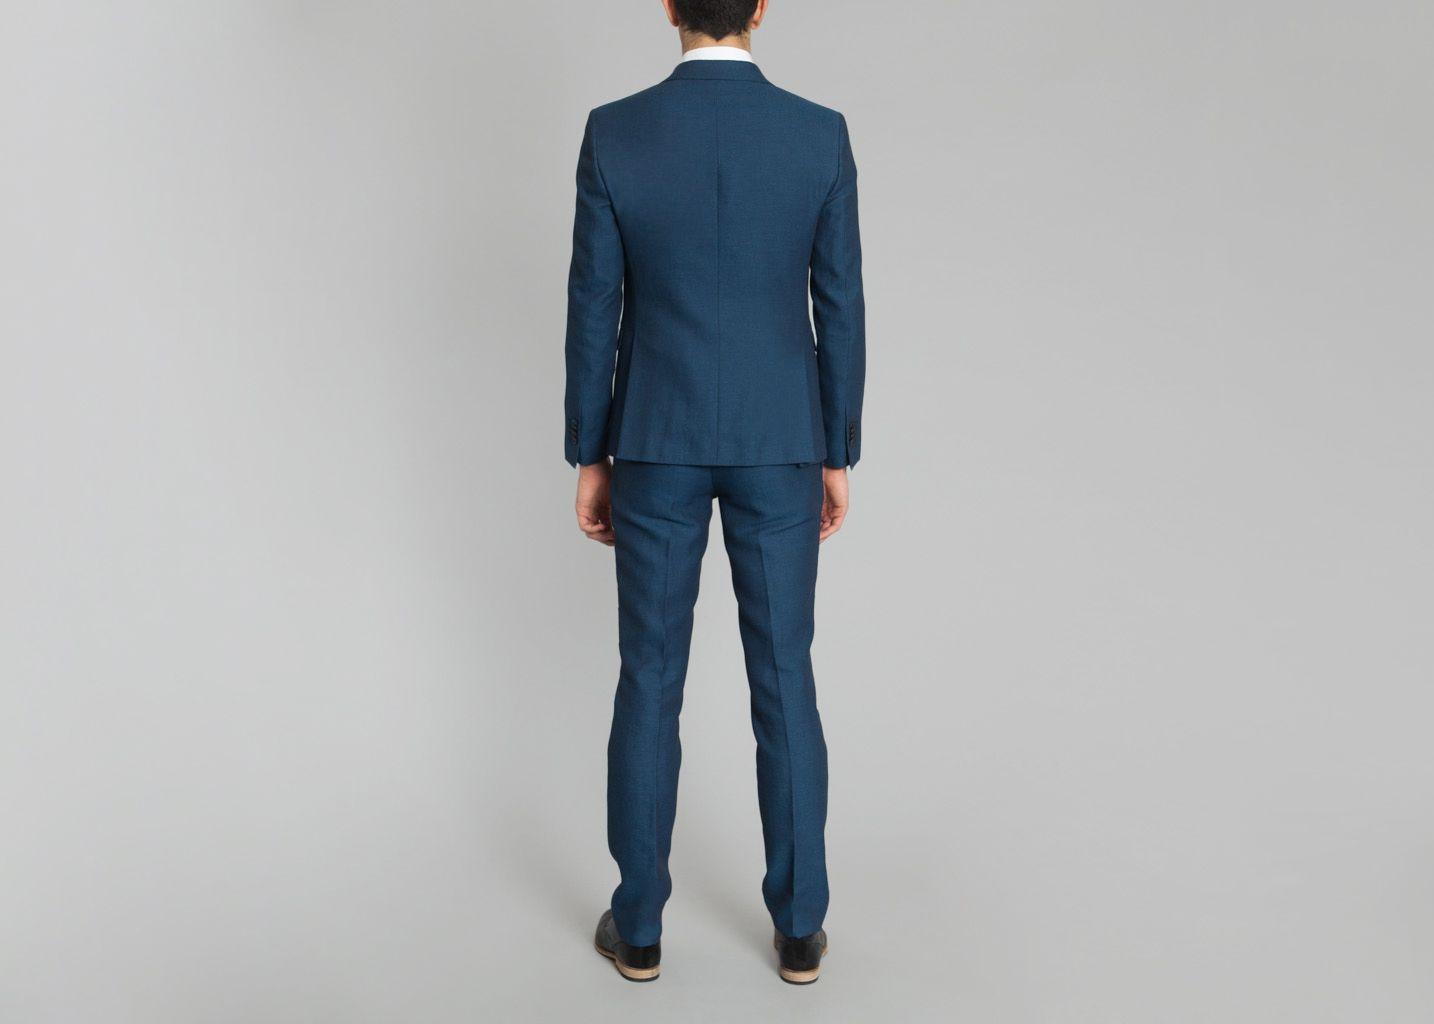 costume guillaume ly adams bleu canard l 39 exception. Black Bedroom Furniture Sets. Home Design Ideas